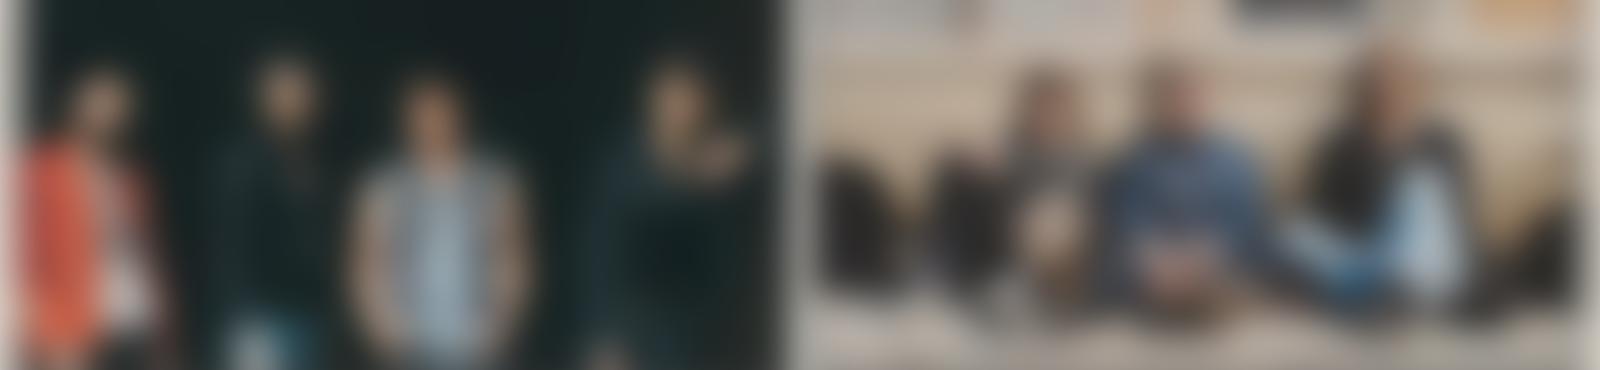 Blurred 751fd41b 602d 4a70 b795 b90af260c527